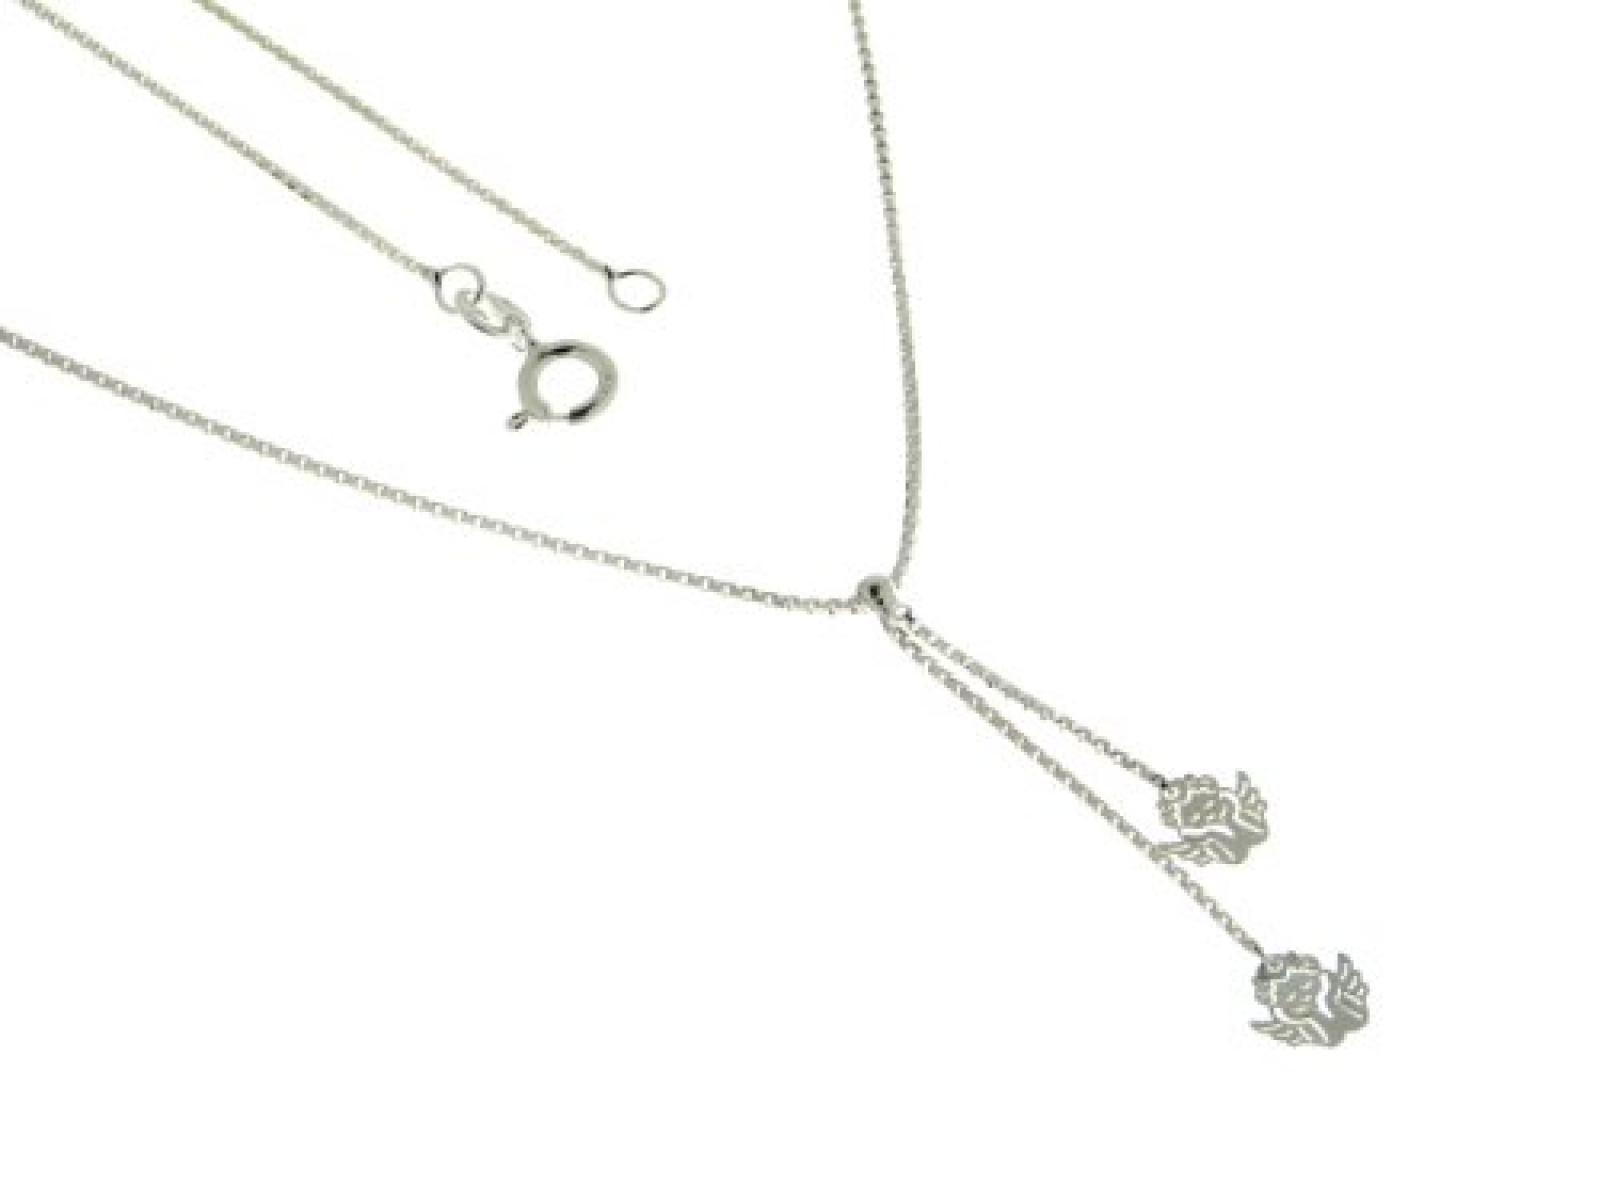 Kettenworld Damen Halskette 925 Sterling Silber 38 cm 294478